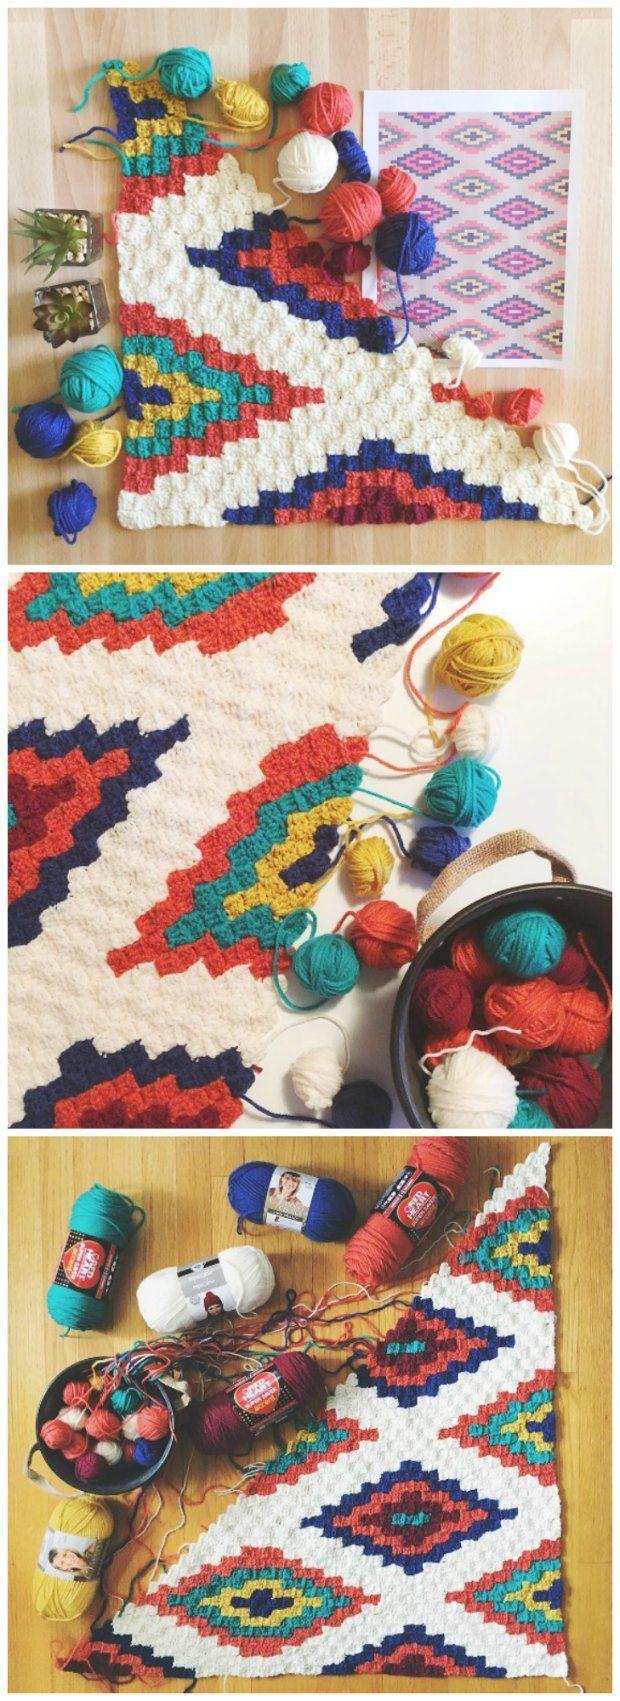 Corner To Corner Crochet Southwestern Afghan Throw blanket | Teppich ...